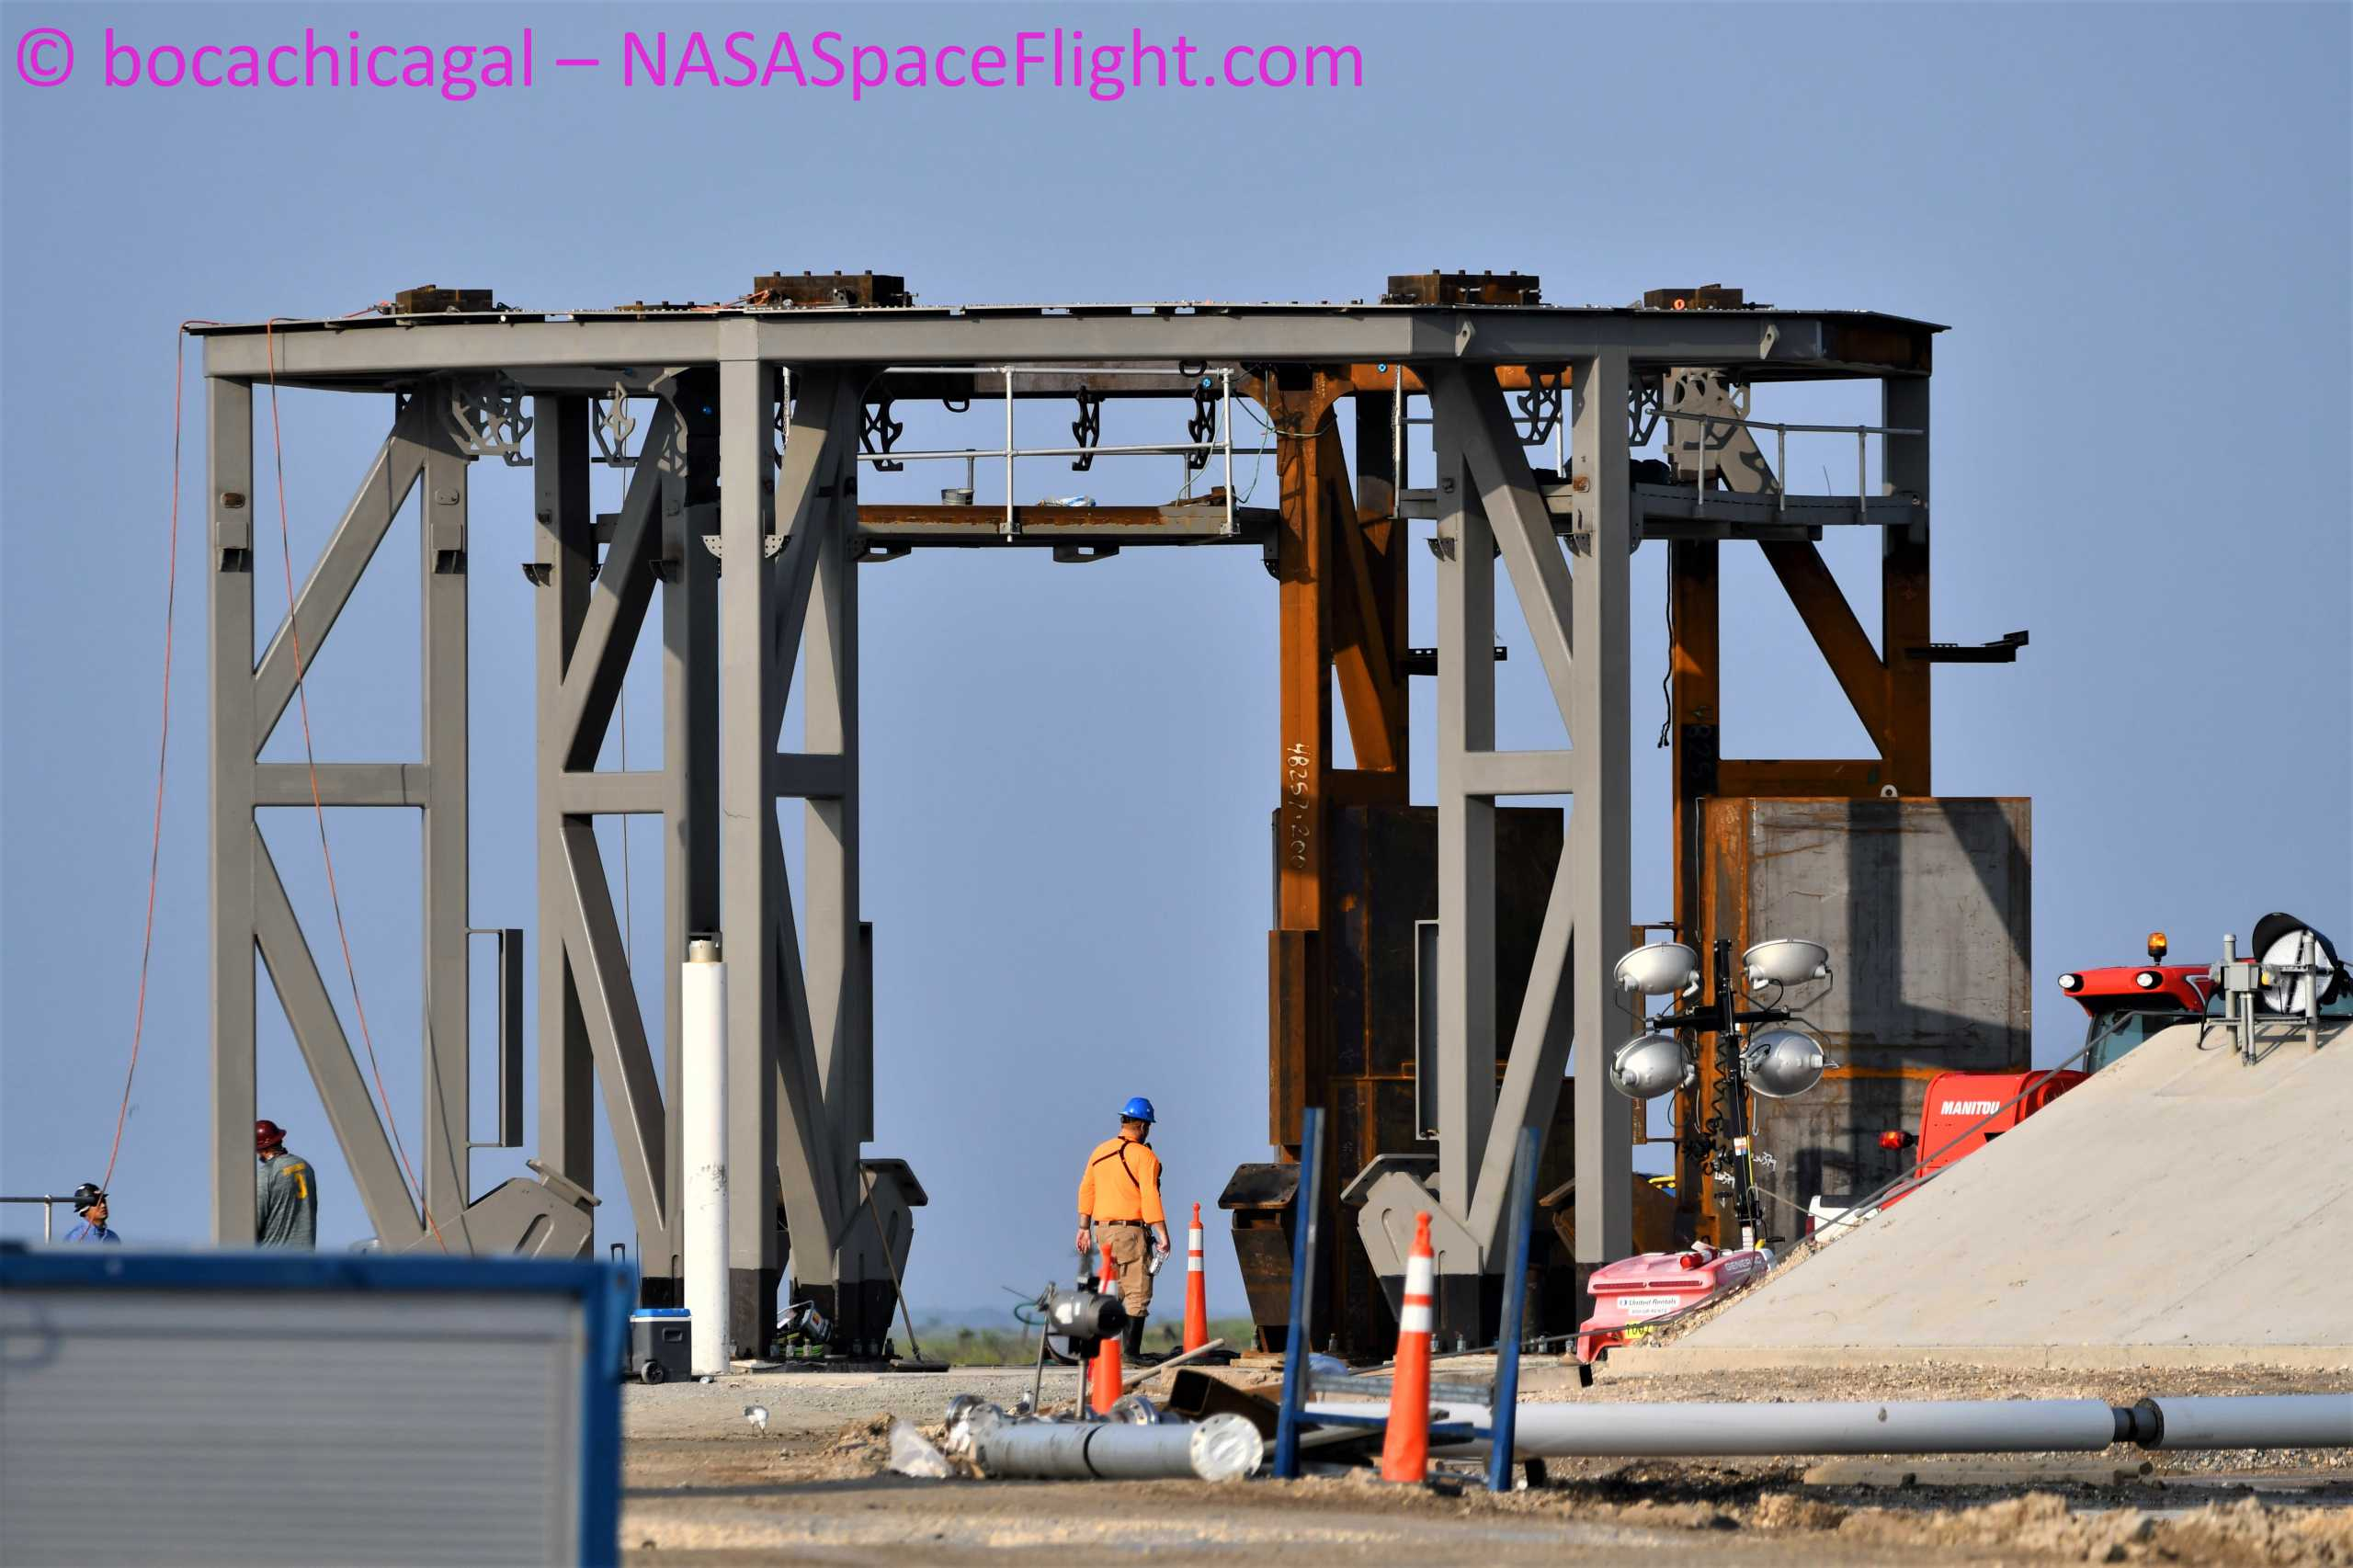 Starship Boca Chica 092020 (NASASpaceflight – bocachicagal) launch mount #3 1 (c)